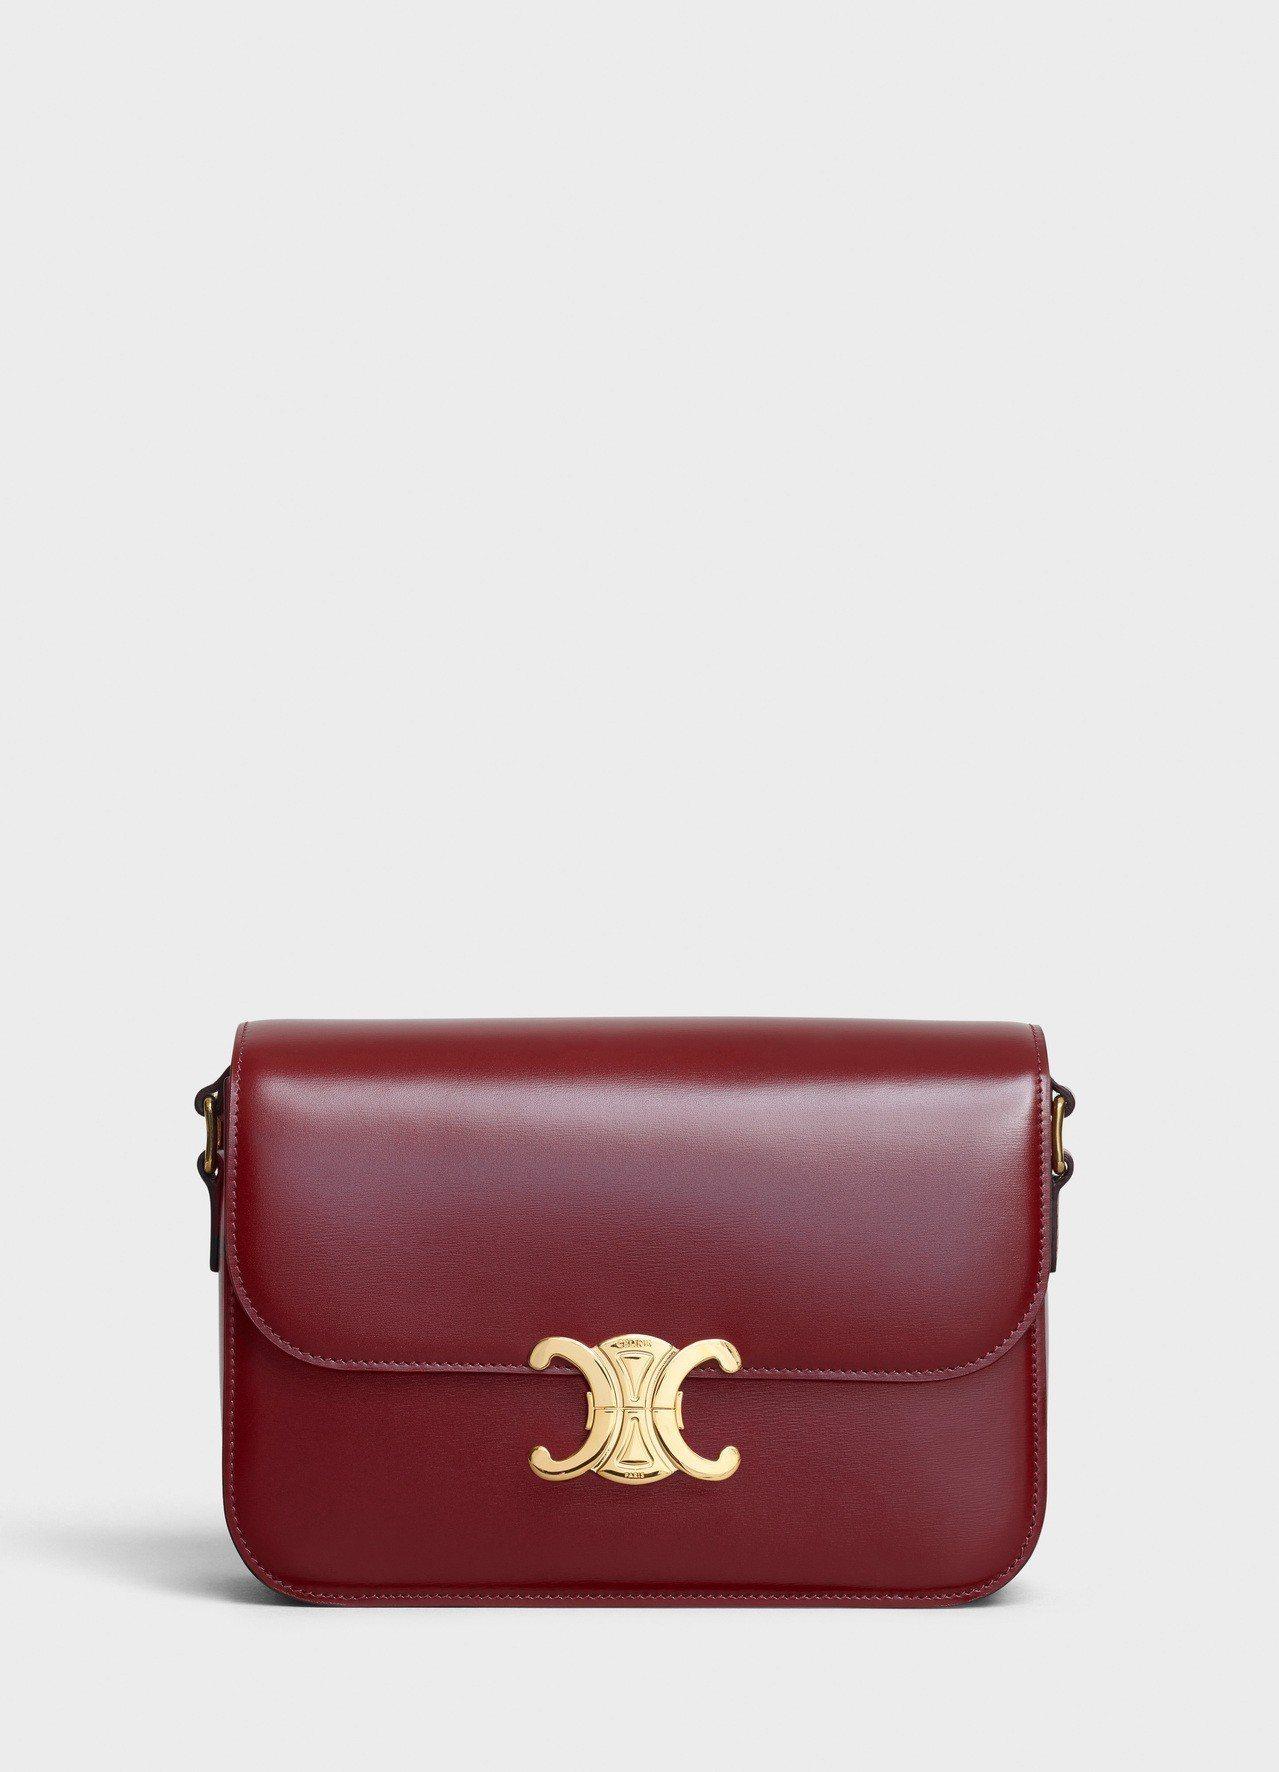 Triomphe淡酒紅光滑小牛皮中型肩背包,售價11萬5,000元。圖/CELI...